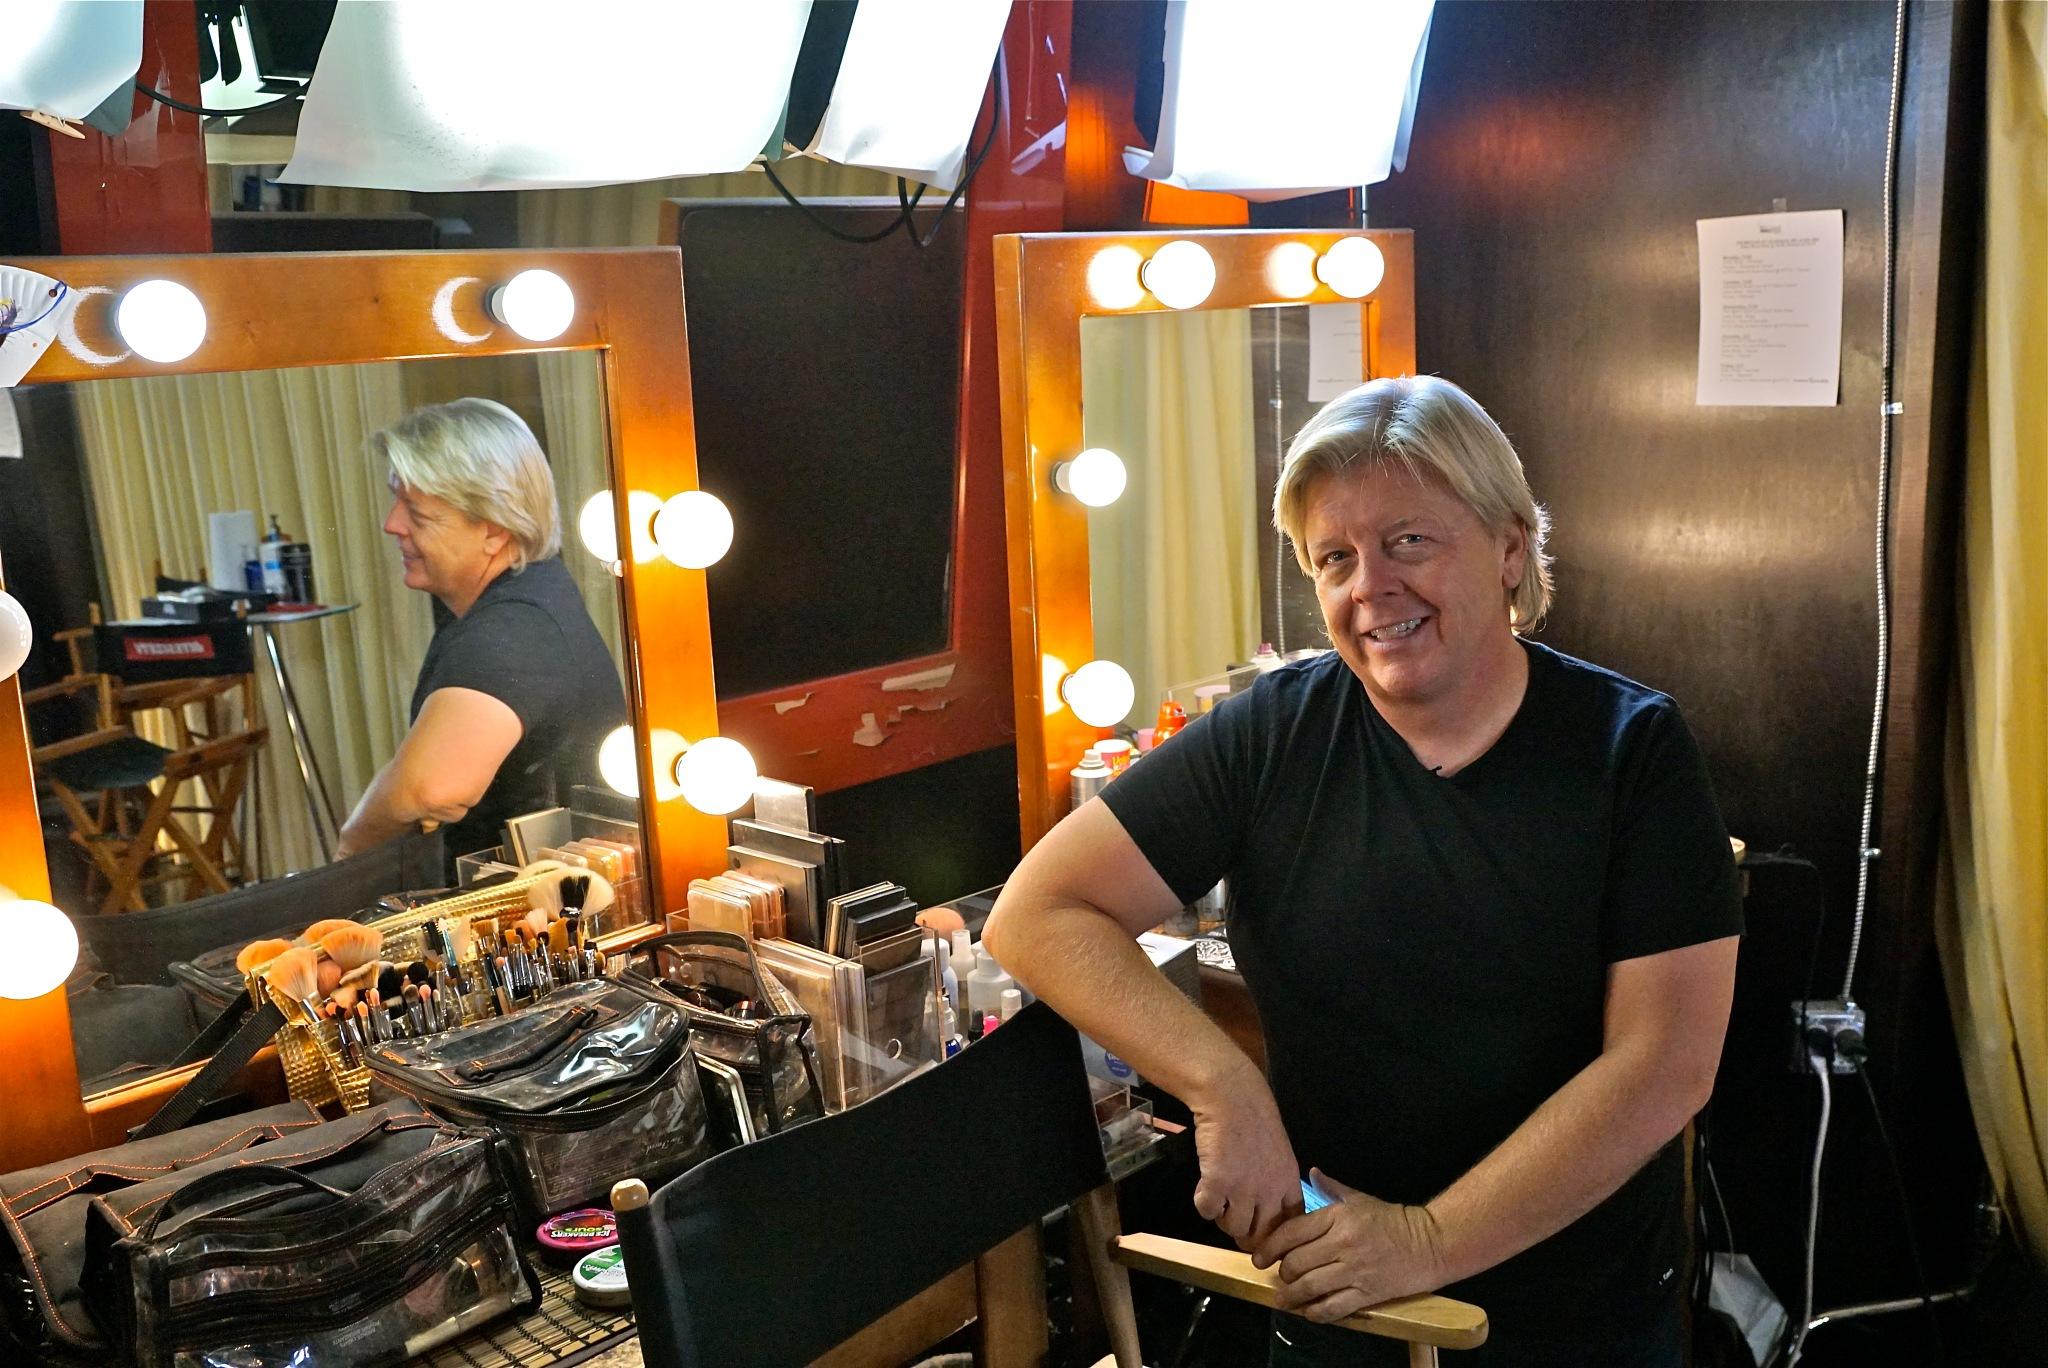 waiting on hair & make-up by Debi Staron